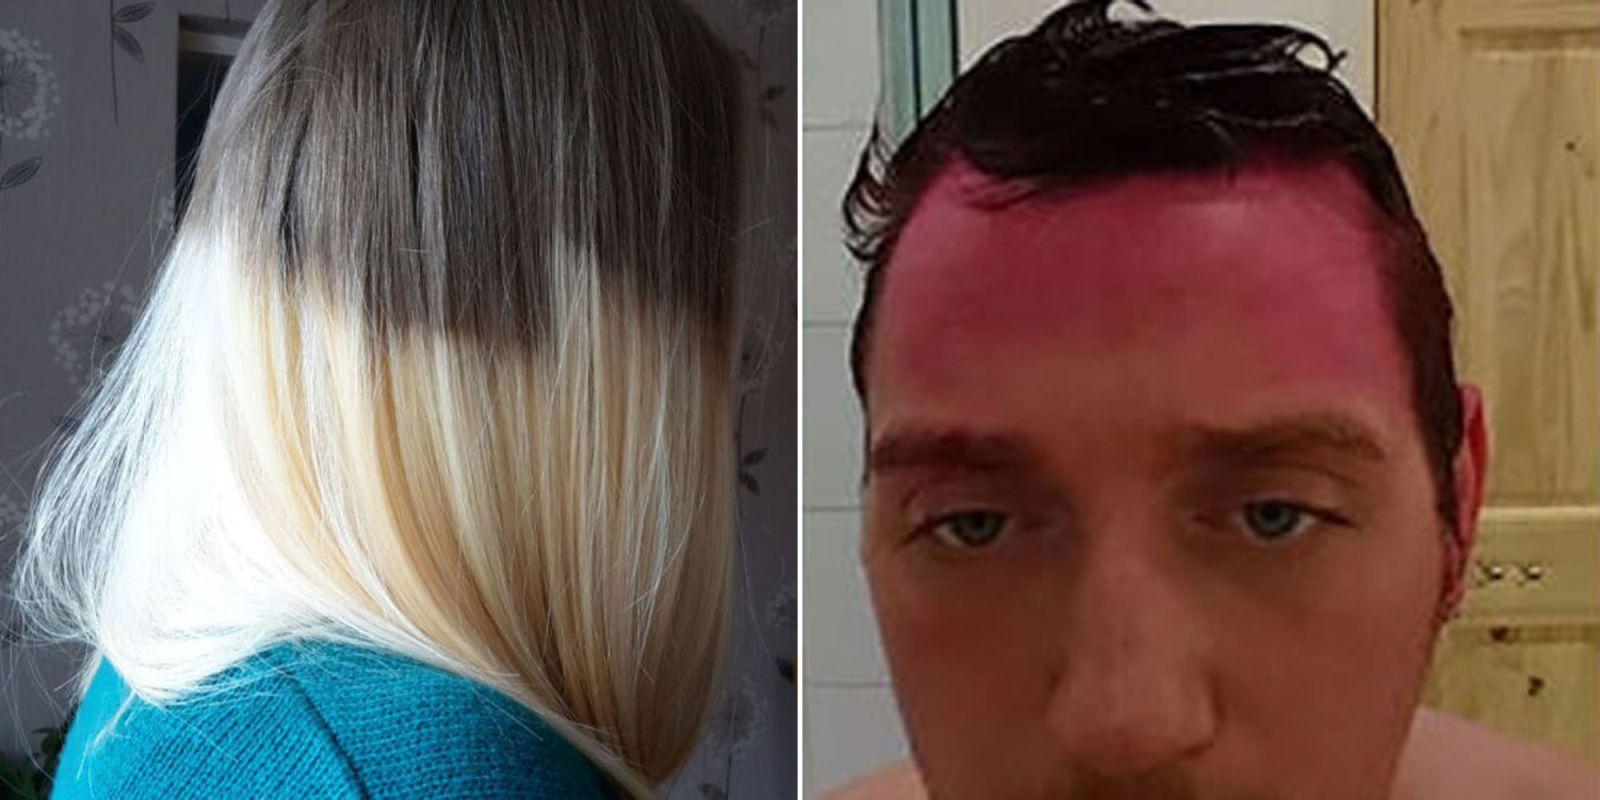 9 Hair Dye Fails That Are Totally Hilarious Black Hair Dye Hair Fails Hair Dye Tips